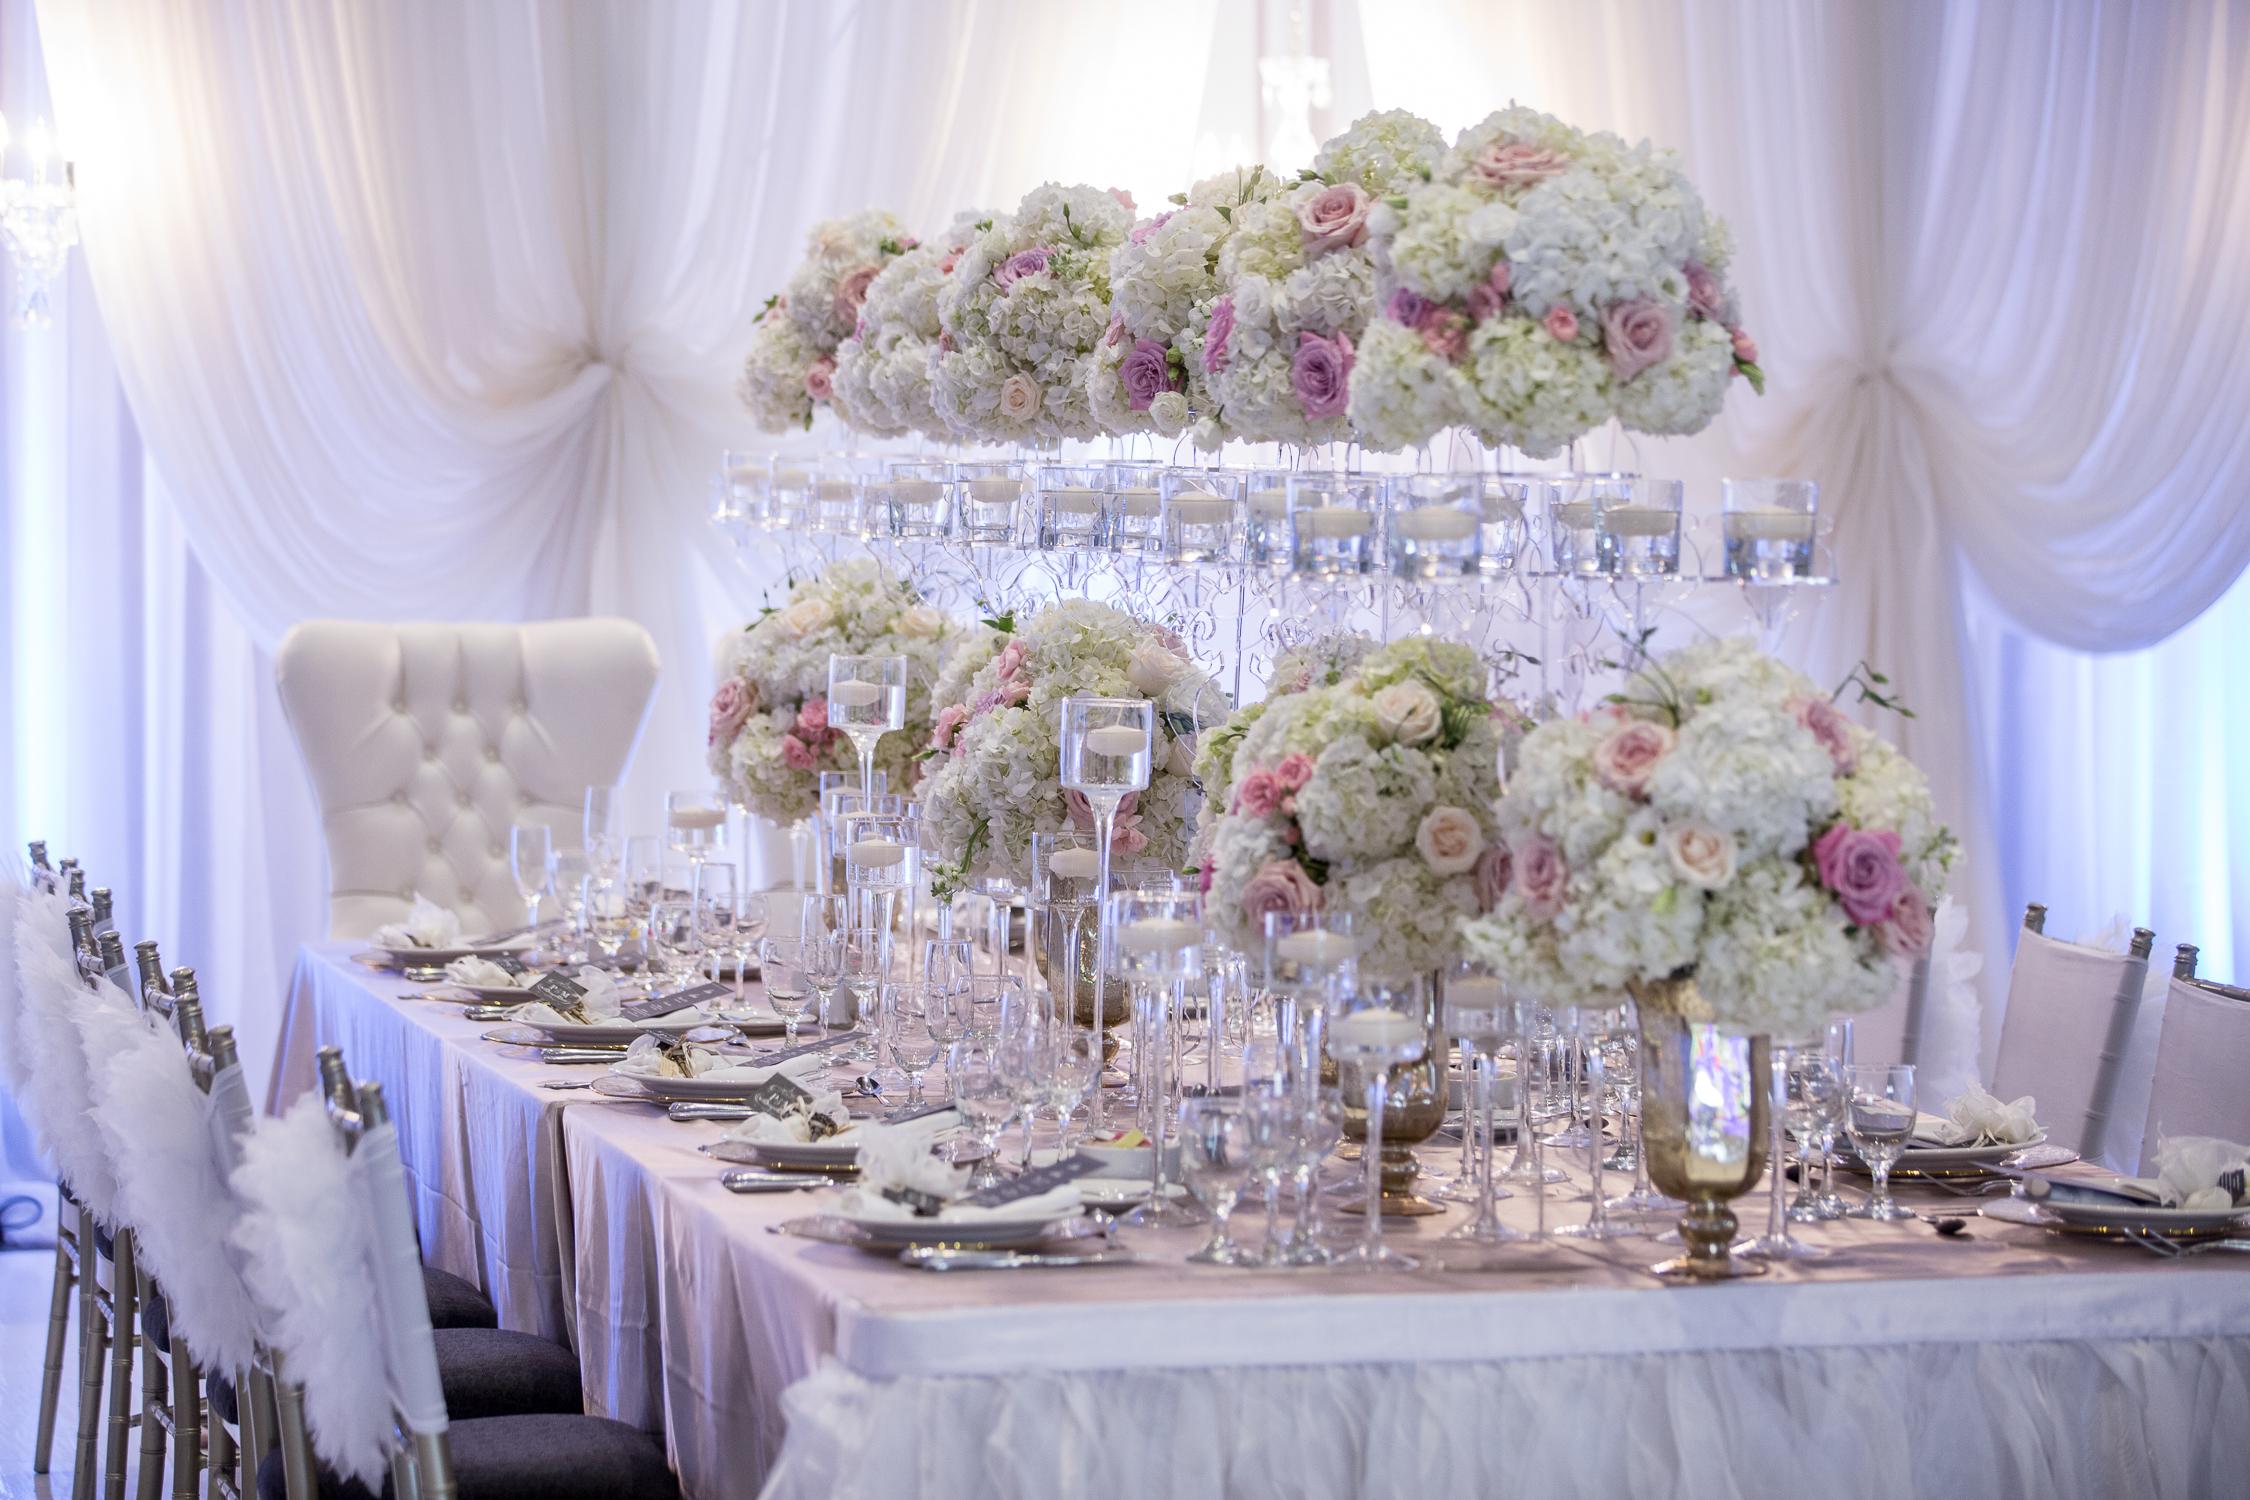 Peter-and-Marie-Wedding-Fontana-Primavera-Graydon-Hall-Manor-Toronto-Ontario-Canada-0030.jpg